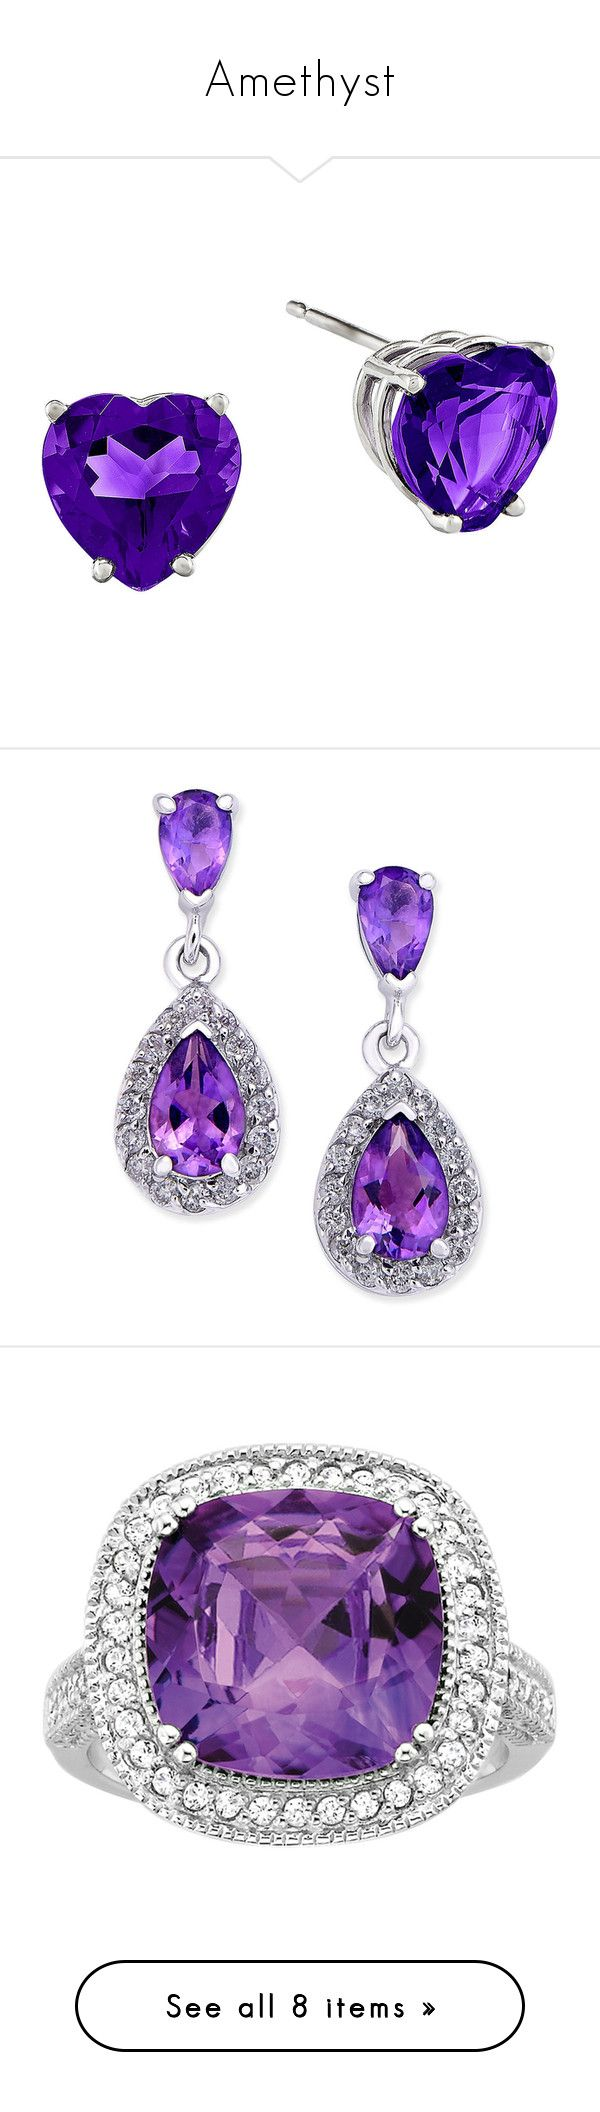 """Amethyst"" by mockingjay5-1 ❤ liked on Polyvore featuring jewelry, earrings, 14 karat gold stud earrings, heart shaped stud earrings, heart stud earrings, 14k earrings, amethyst jewelry, white gold, 14k diamond earrings and amethyst earrings"